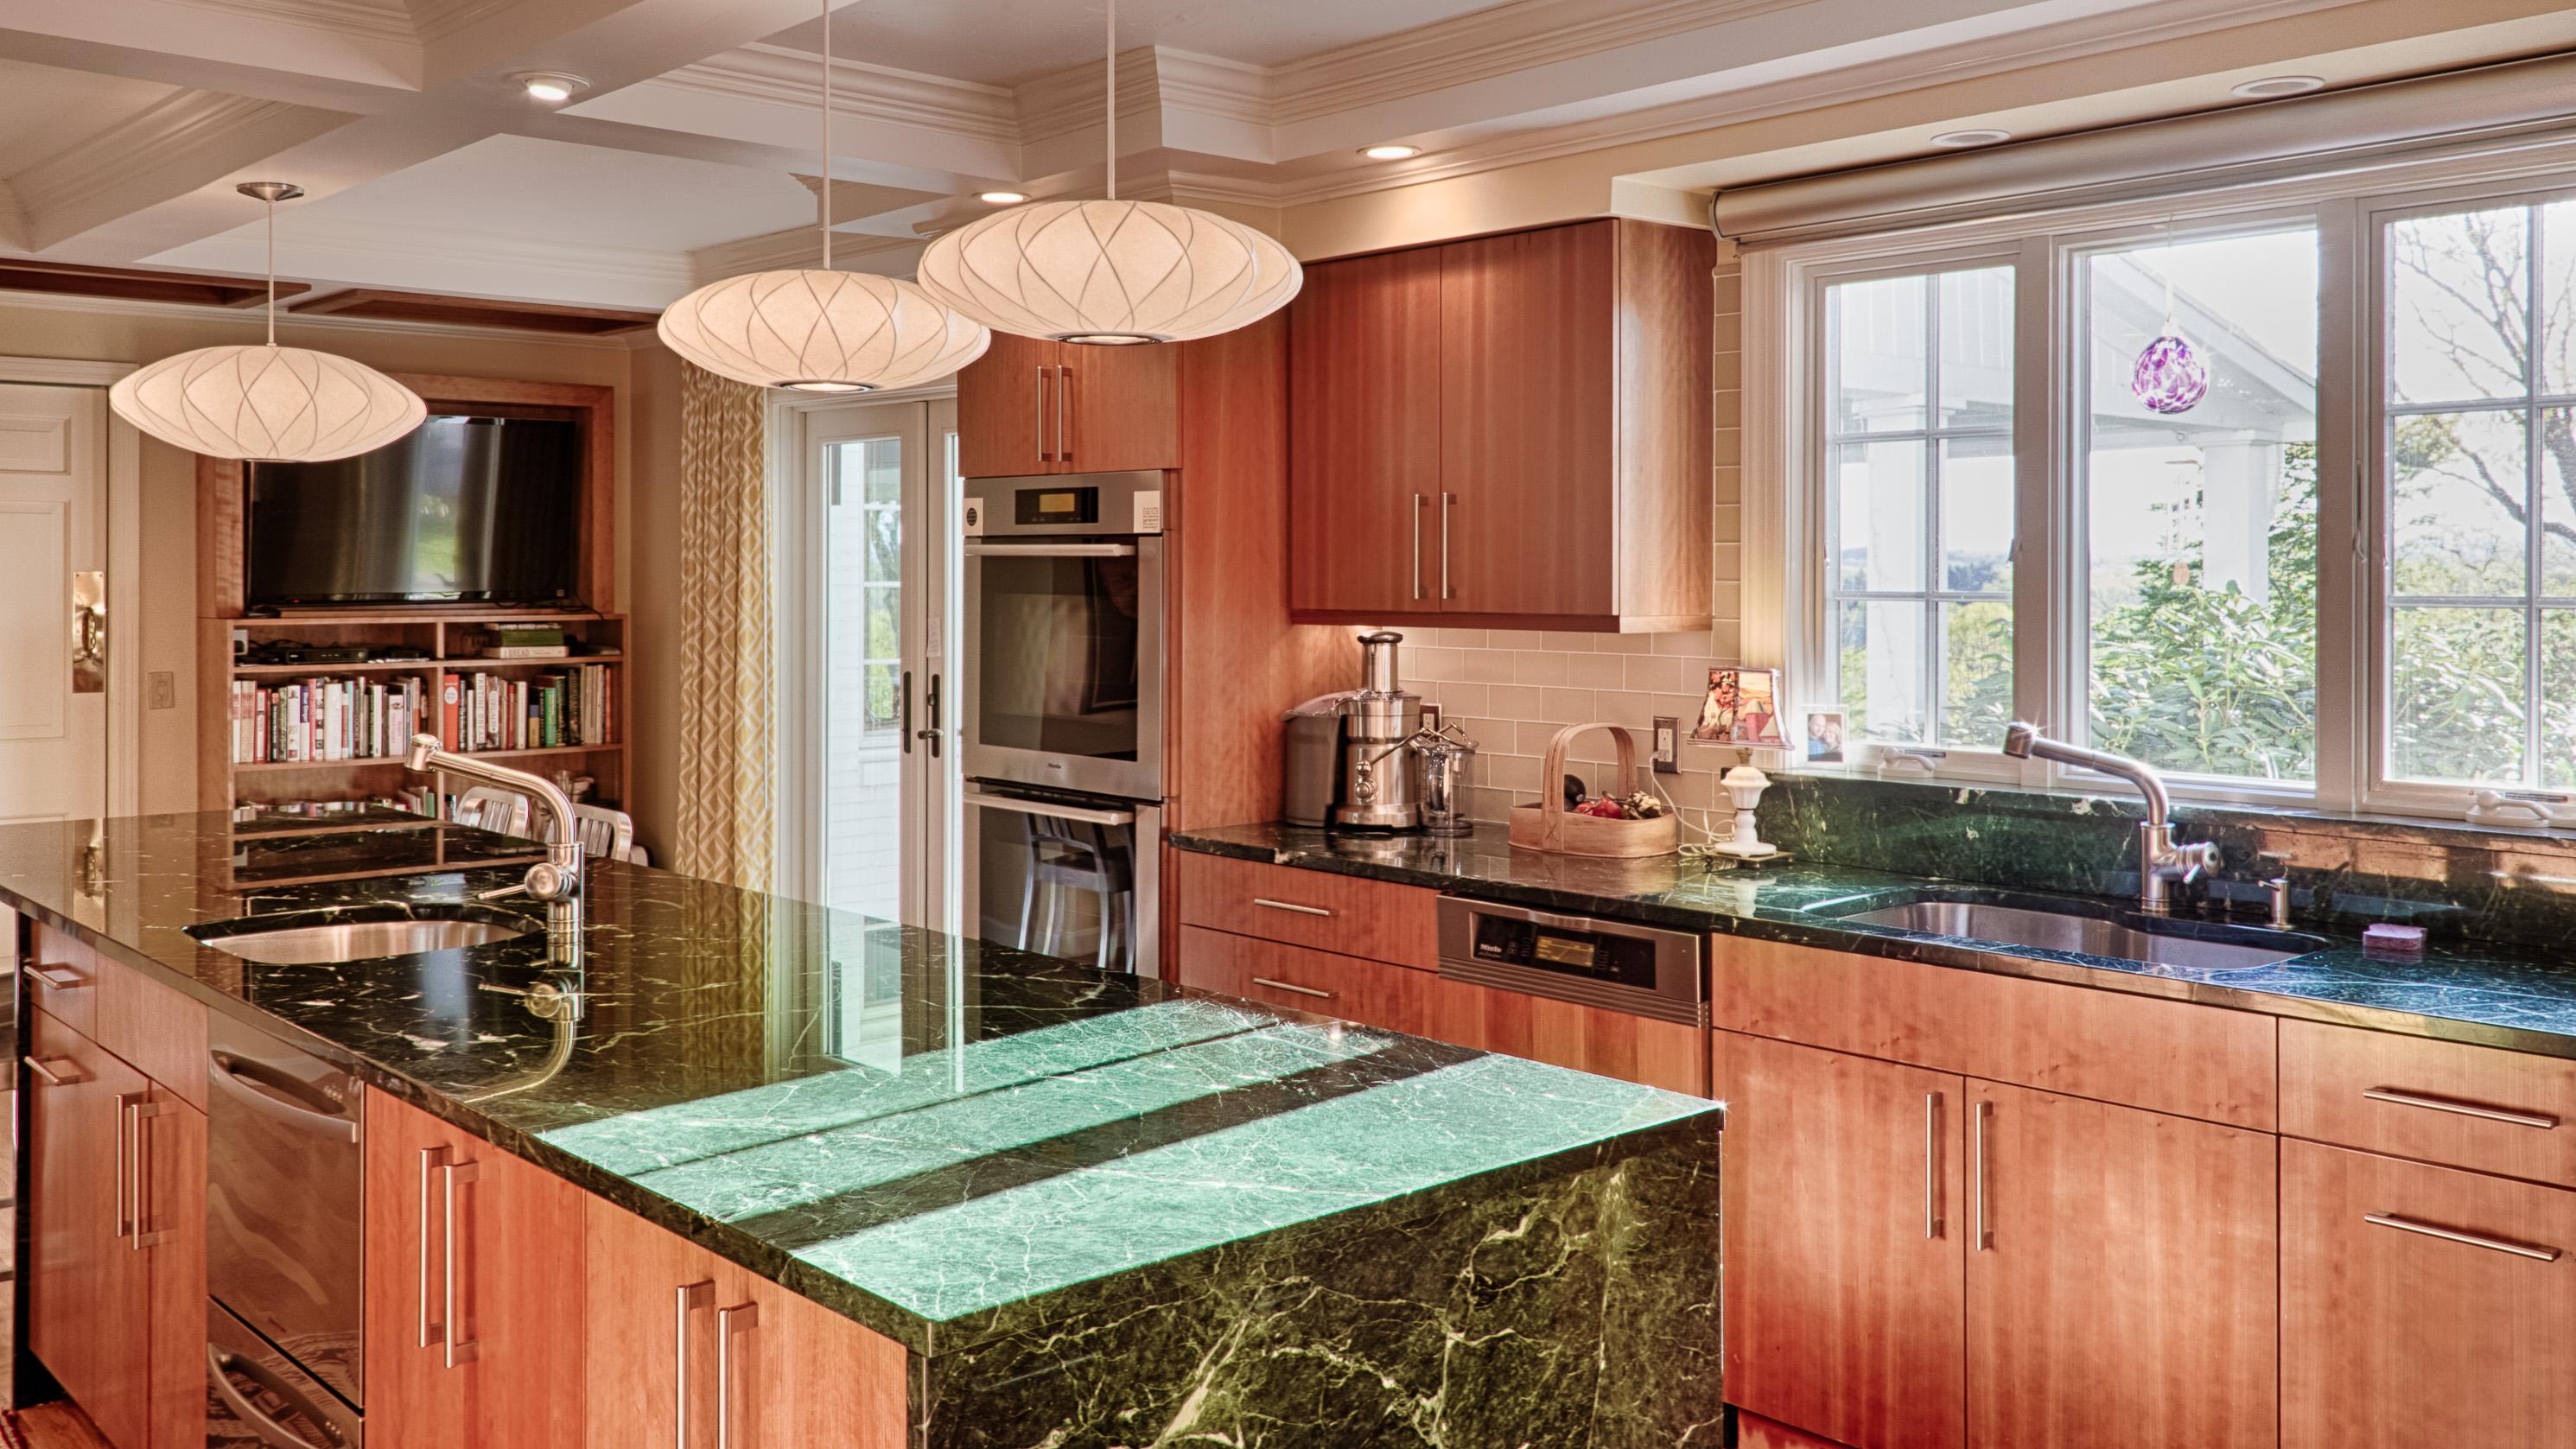 Northern Granite Marble Quartz Western Mass Massachusetts Agawam West  Springfield Counter Tops Vanities Fireplace Natural Stone